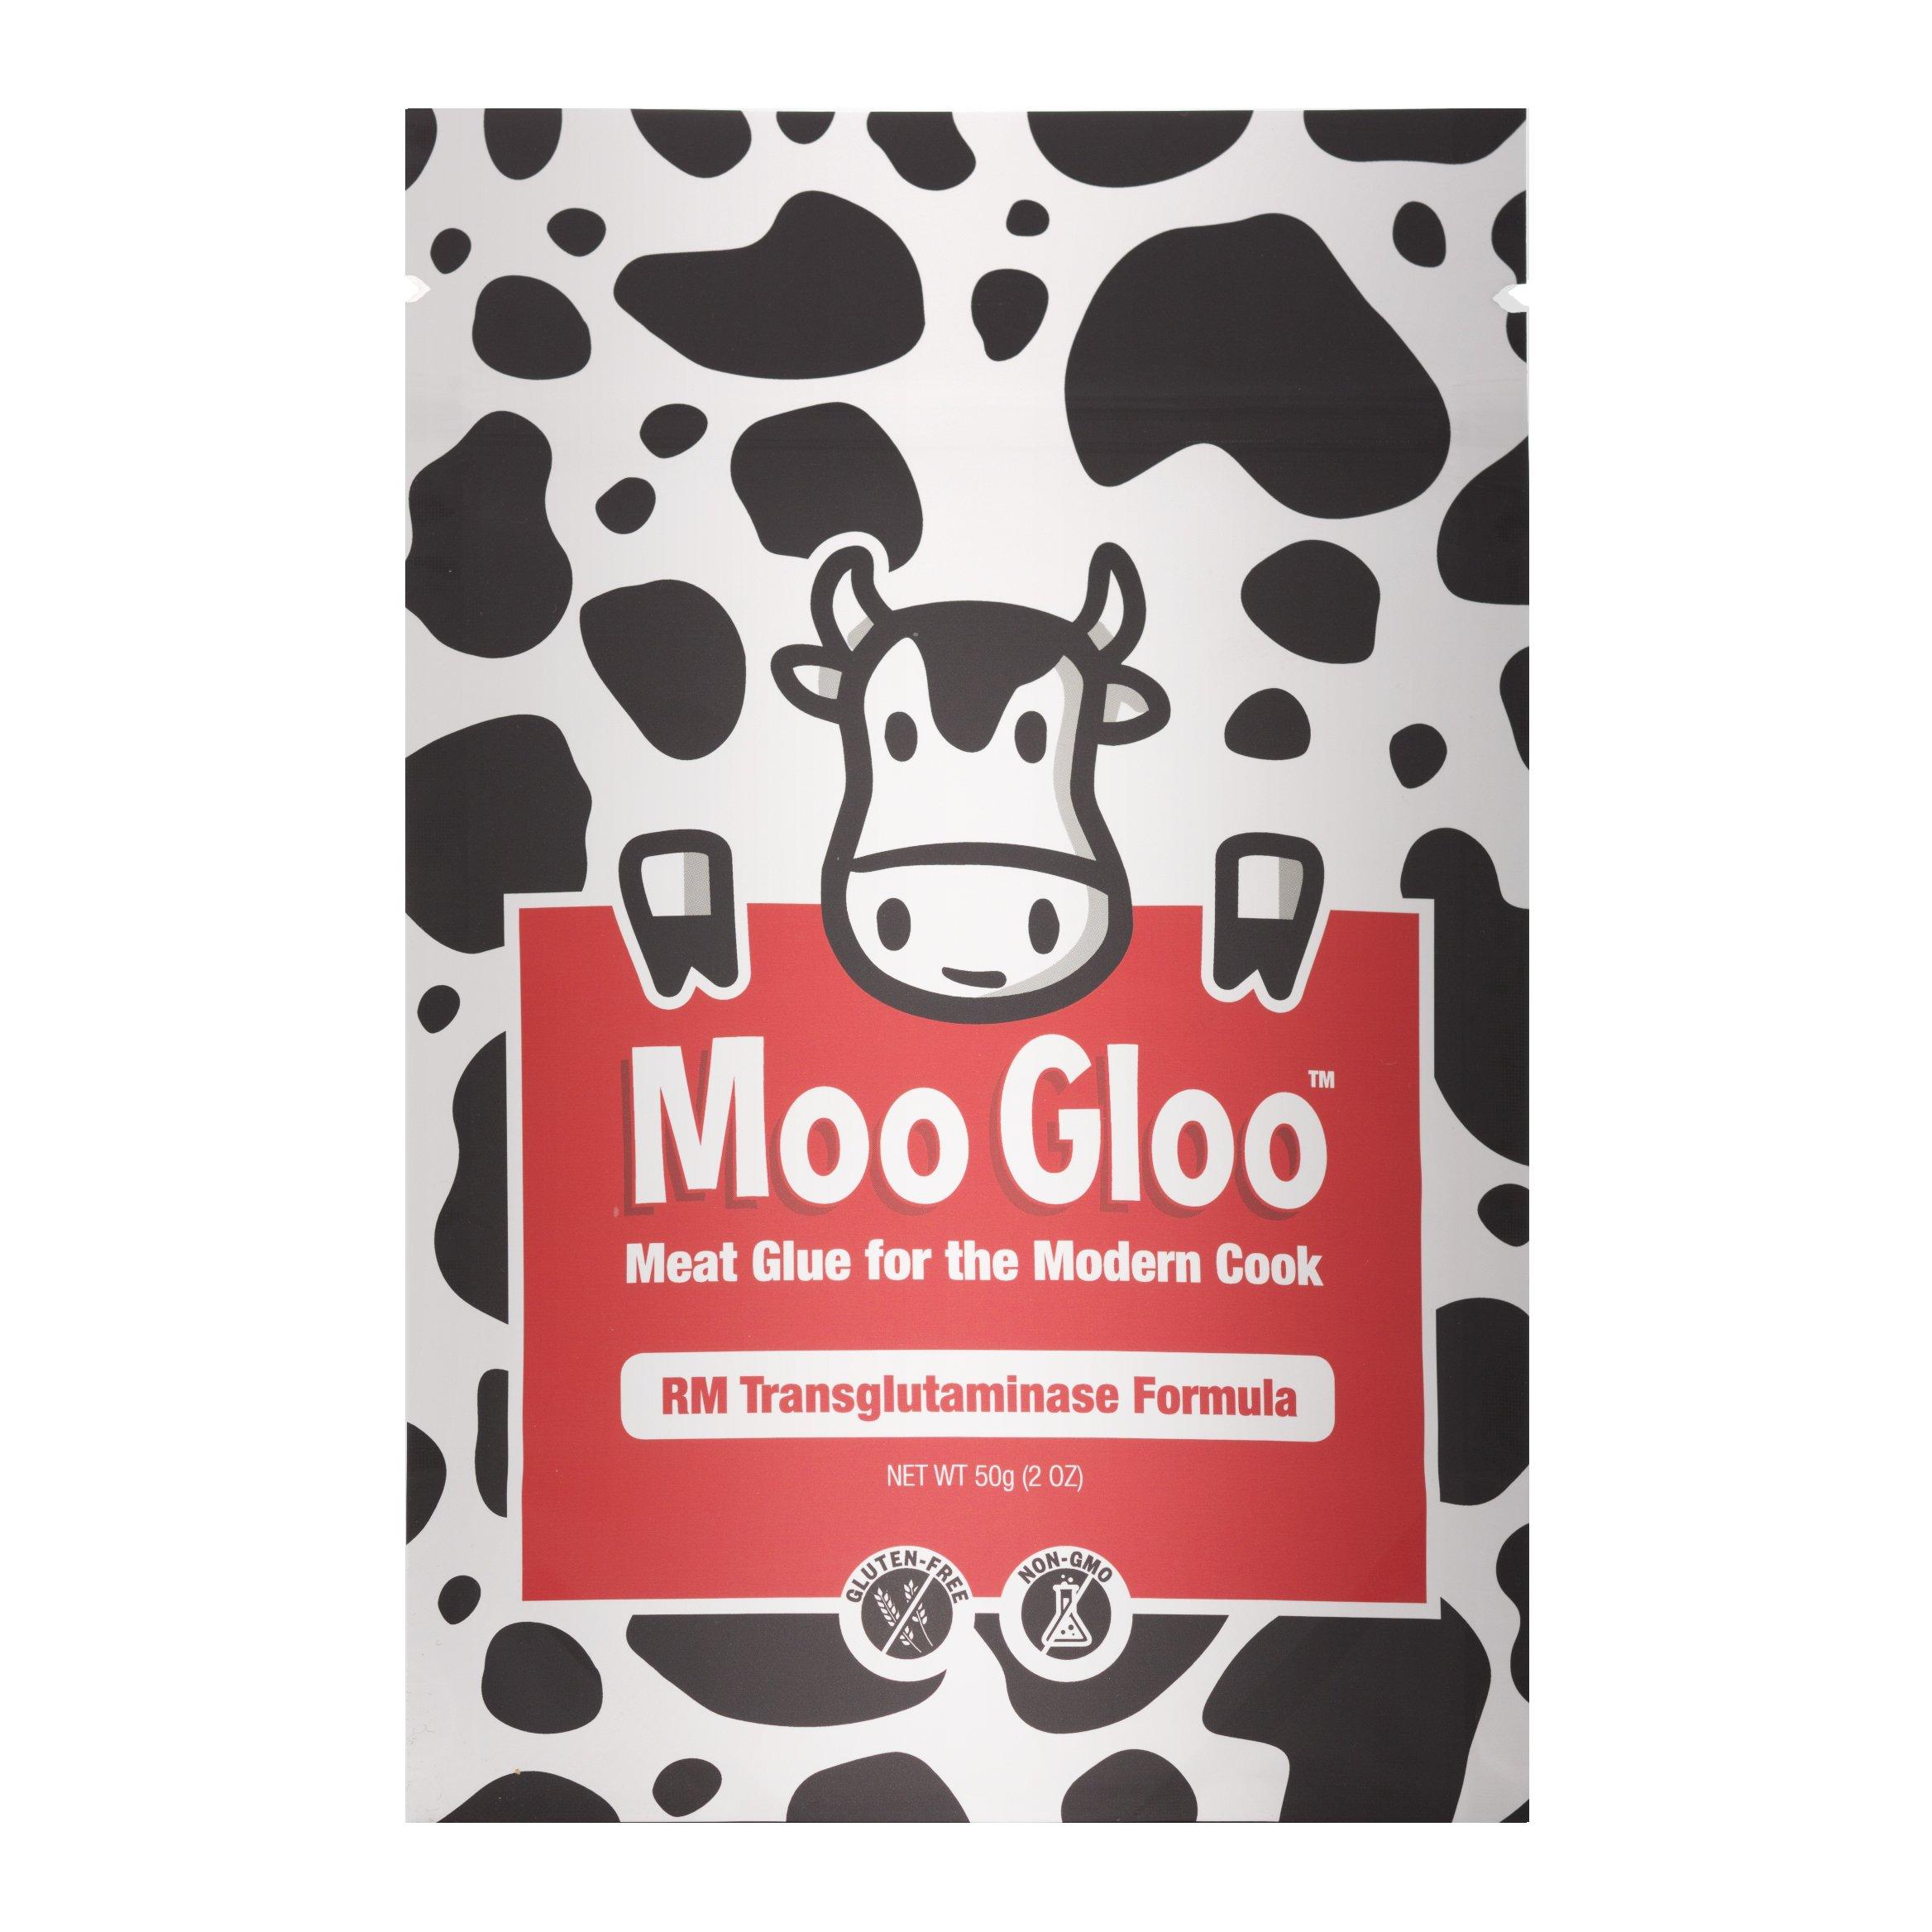 Moo Gloo Value Pack - Transglutaminase - Meat Glue - 150g/6oz. (Bundle with 3 items) by Moo Gloo (Image #2)